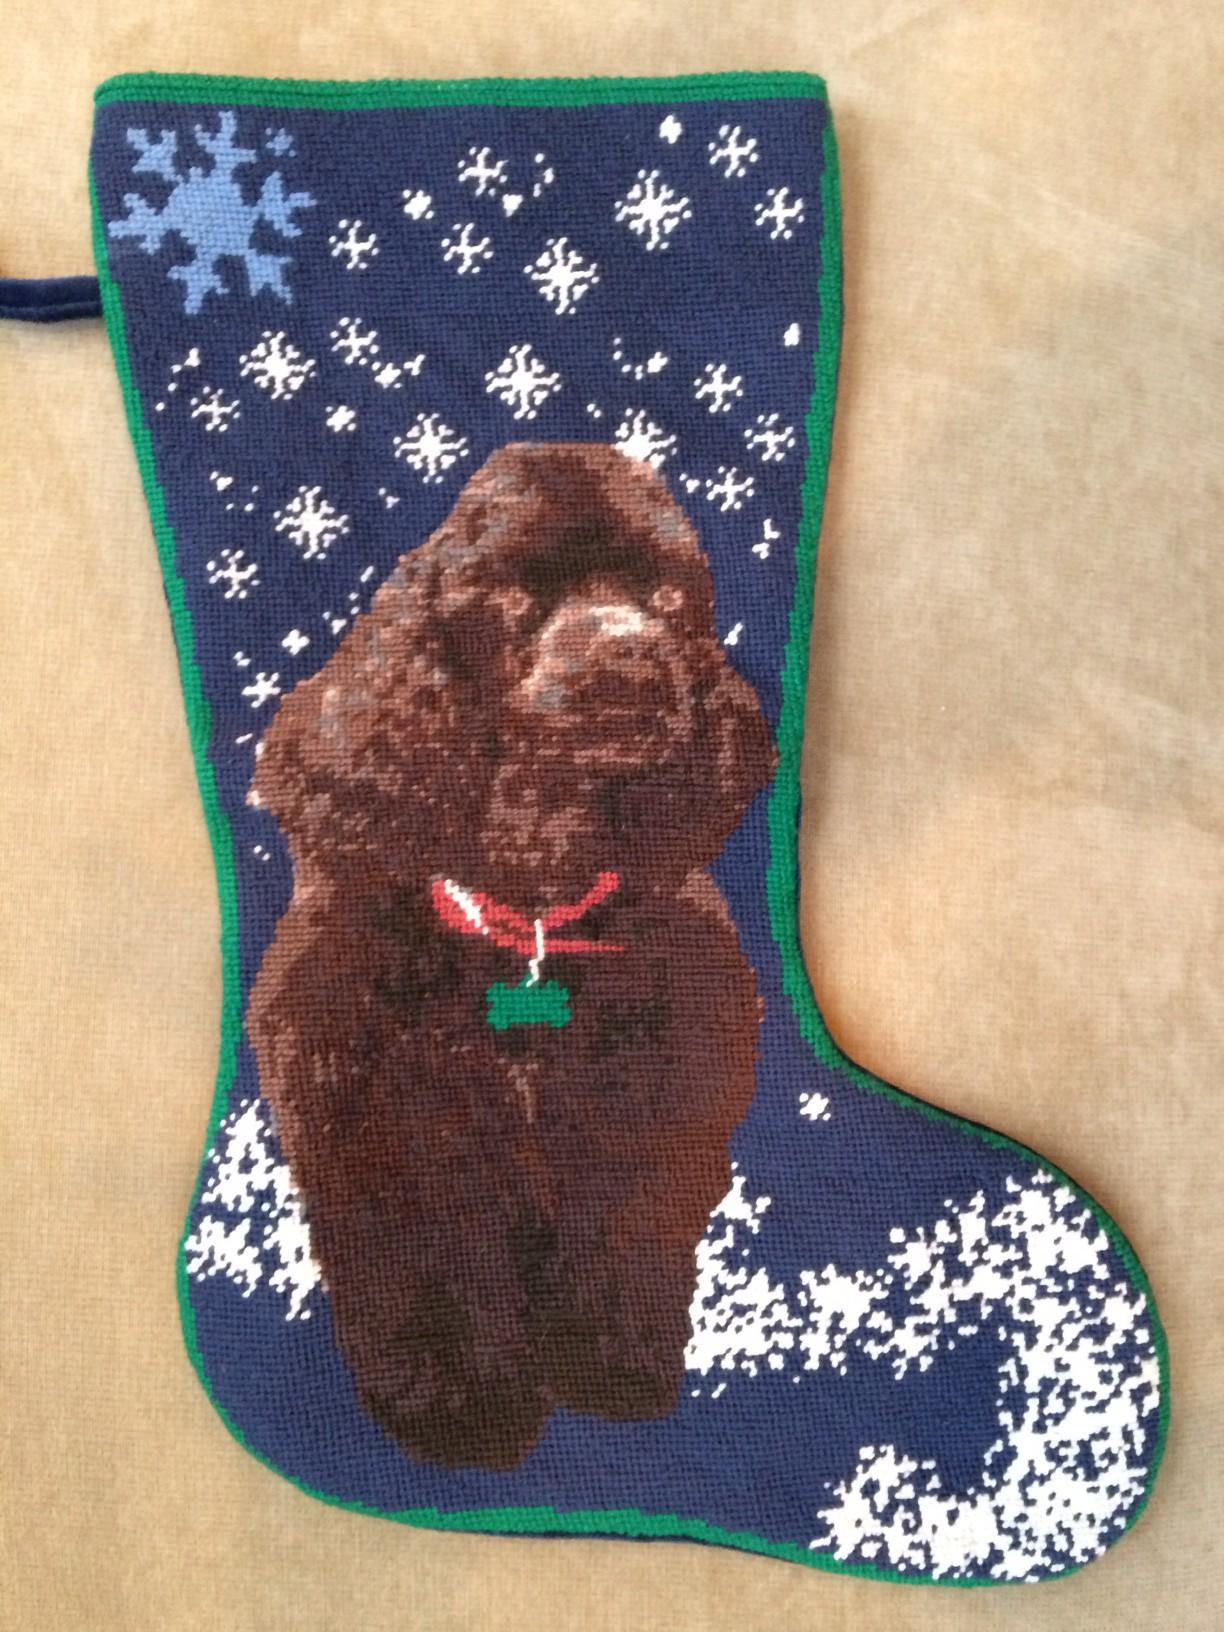 Custom Blue Snowy Needlepoint Stocking with Dog